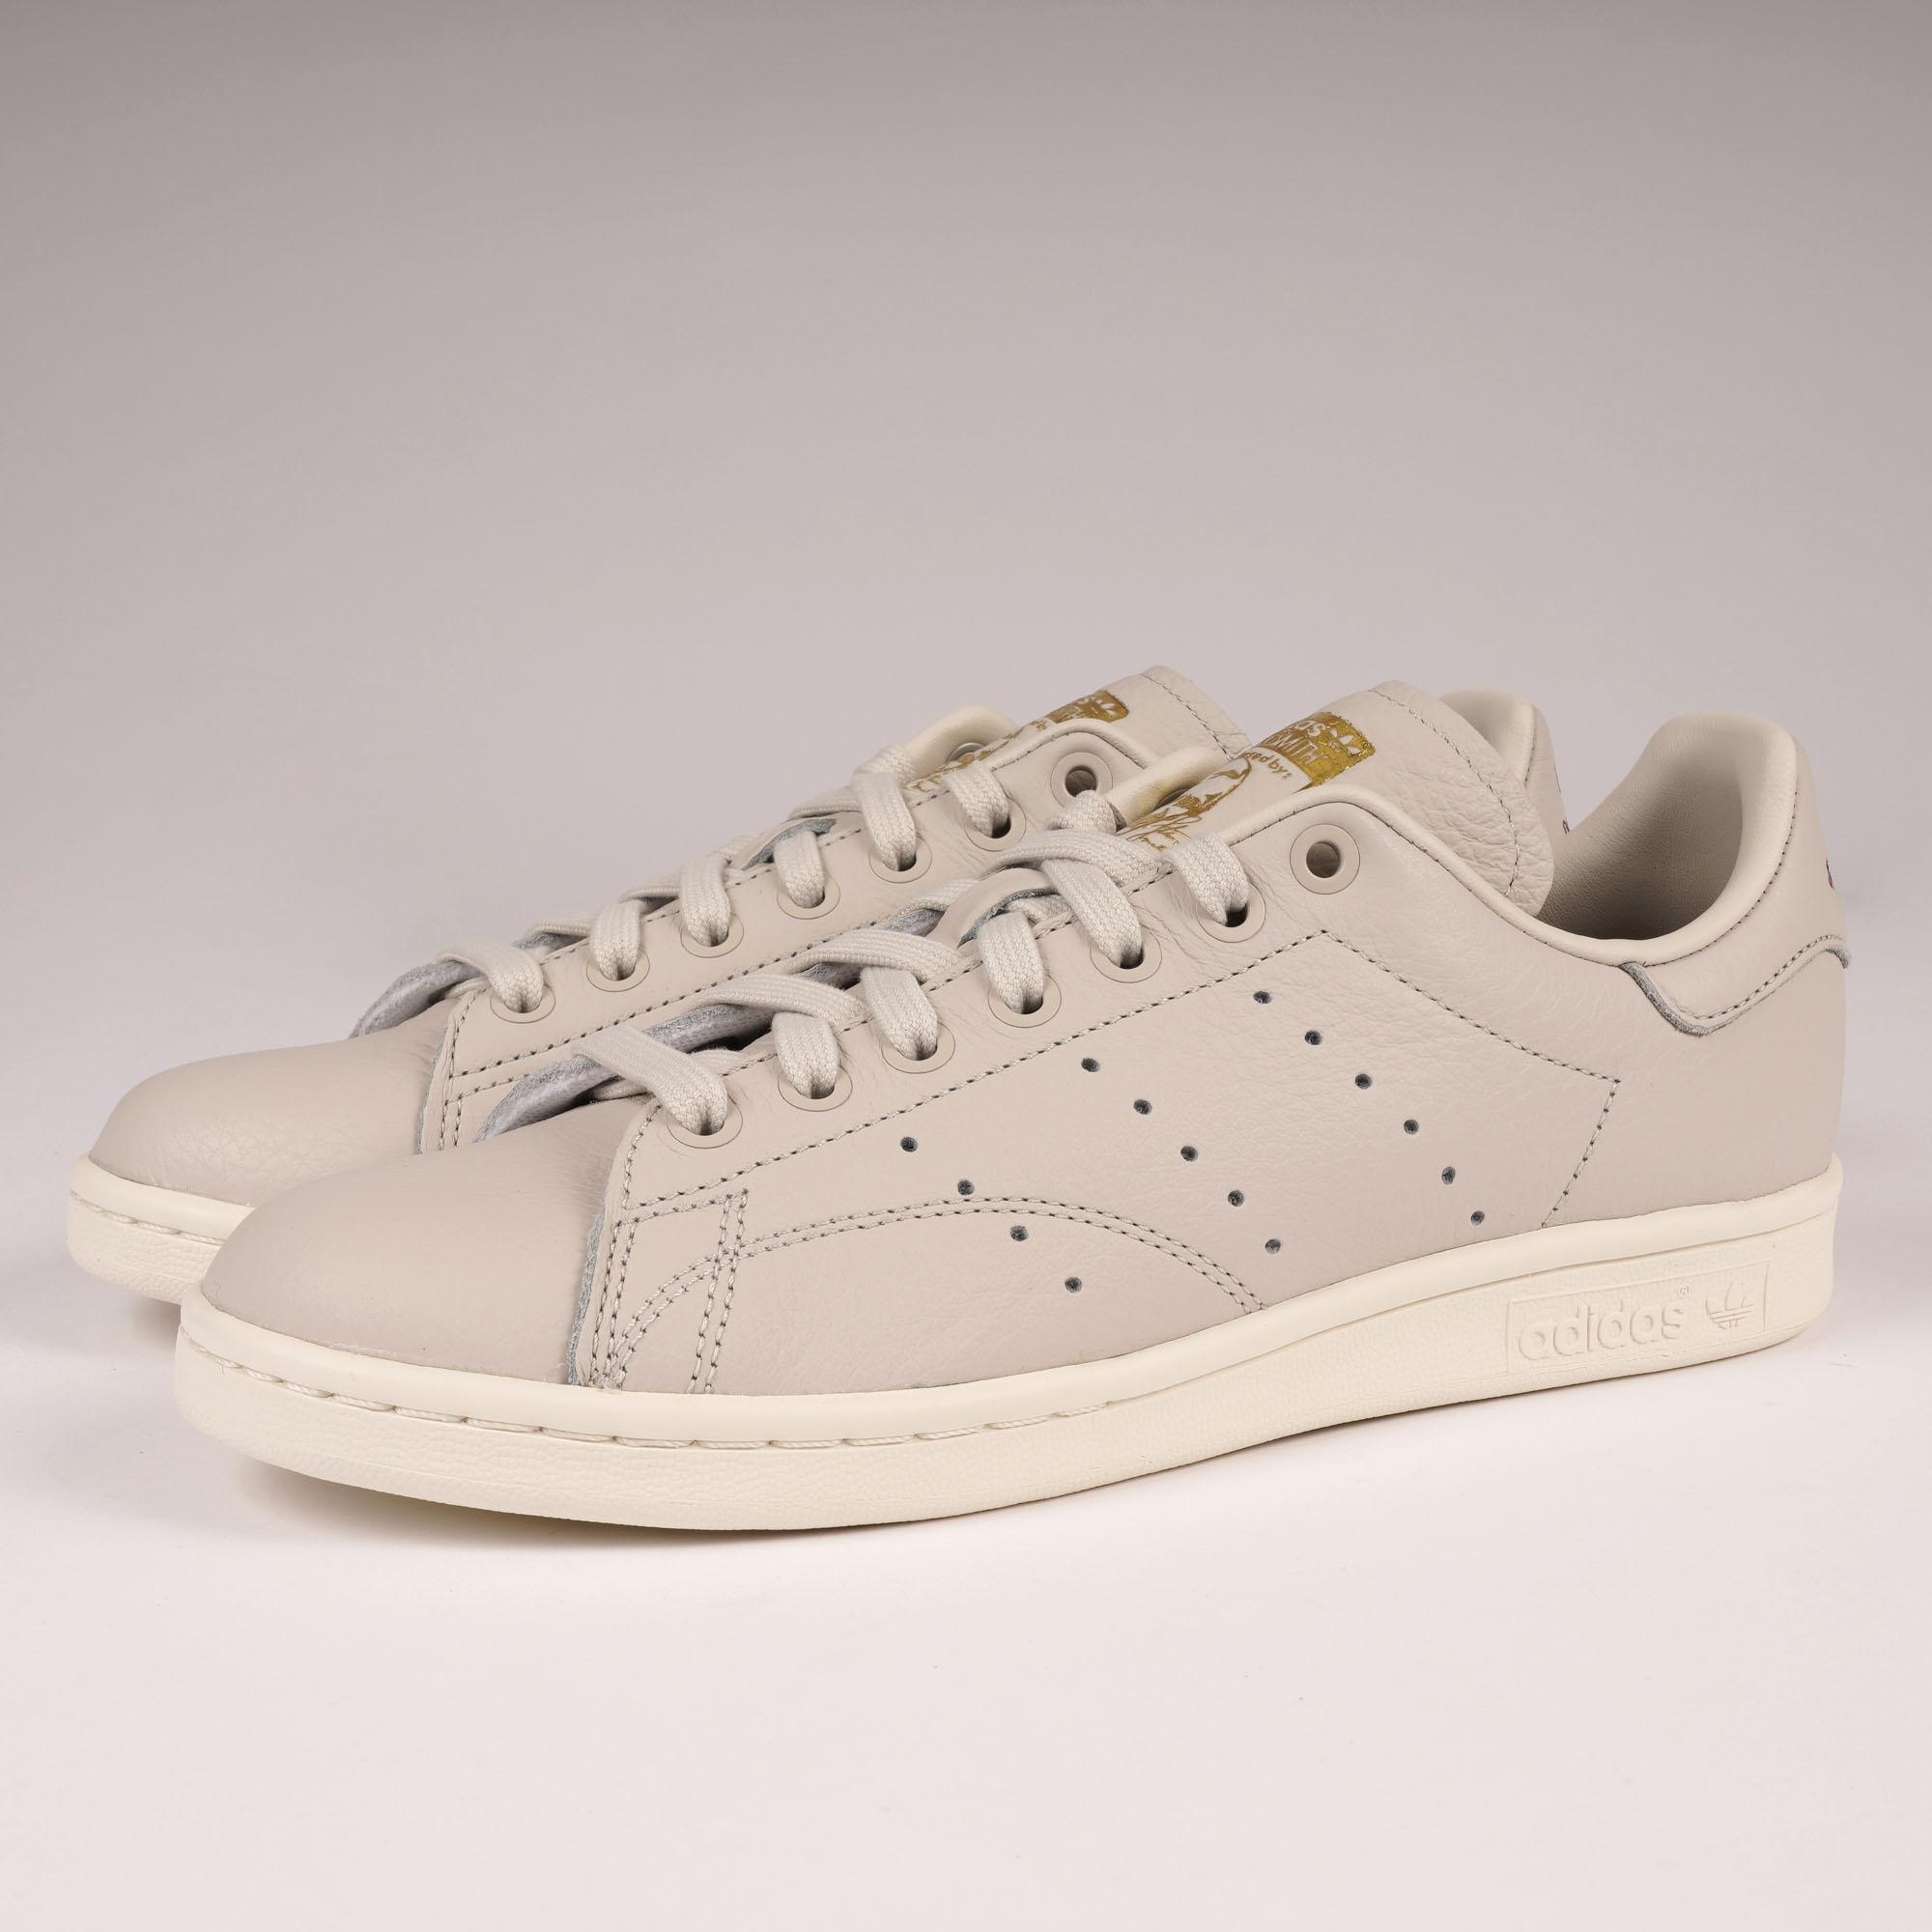 80c99304f73 adidas Originals. Men s Stan Smith - Raw White ...